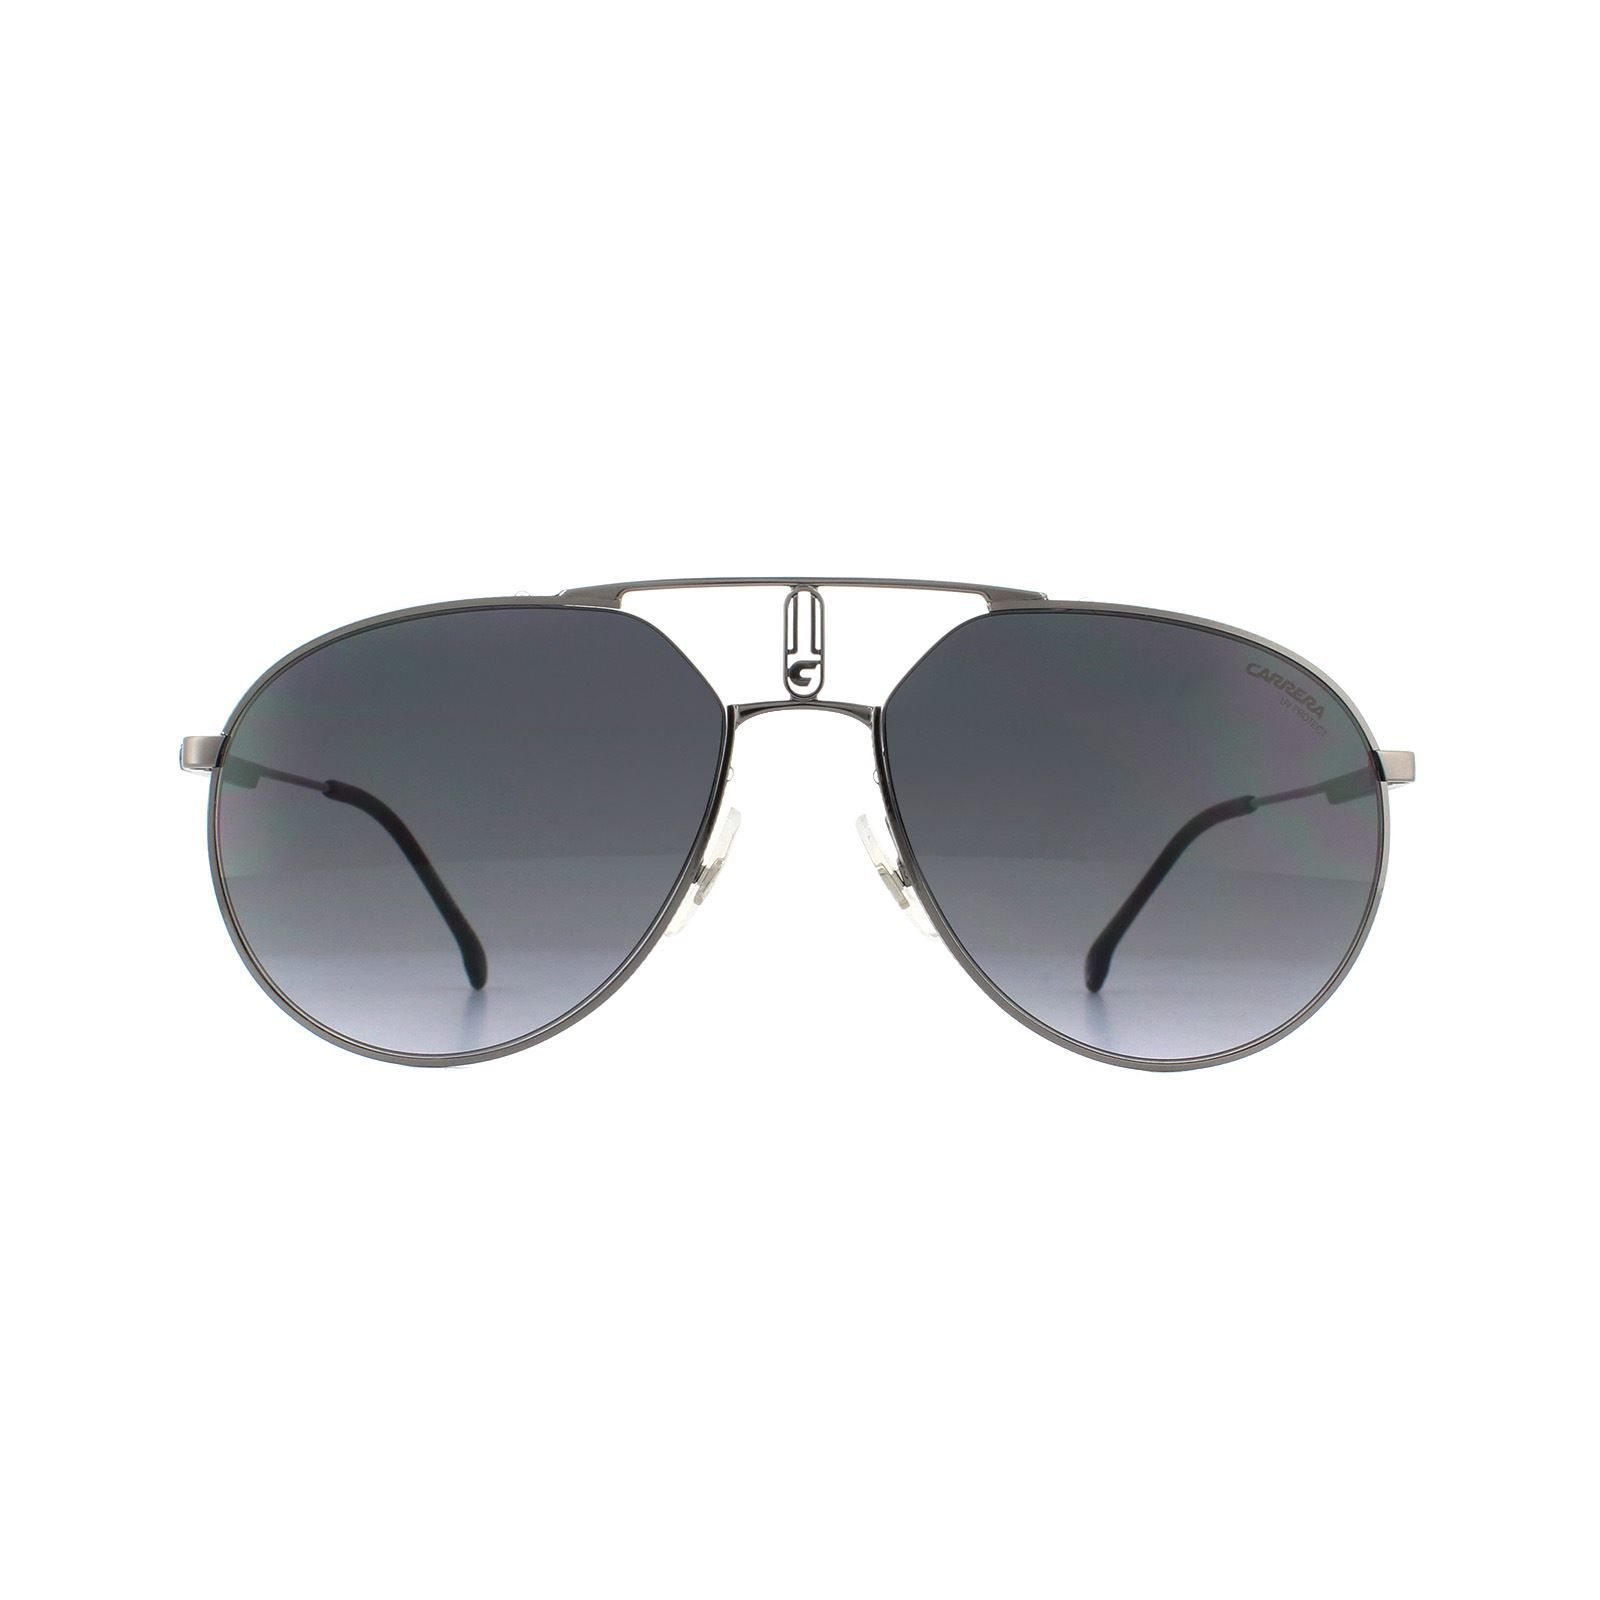 Carrera Sunglasses 1025/S KJ1 9O Dark Ruthenium Dark Grey Gradient